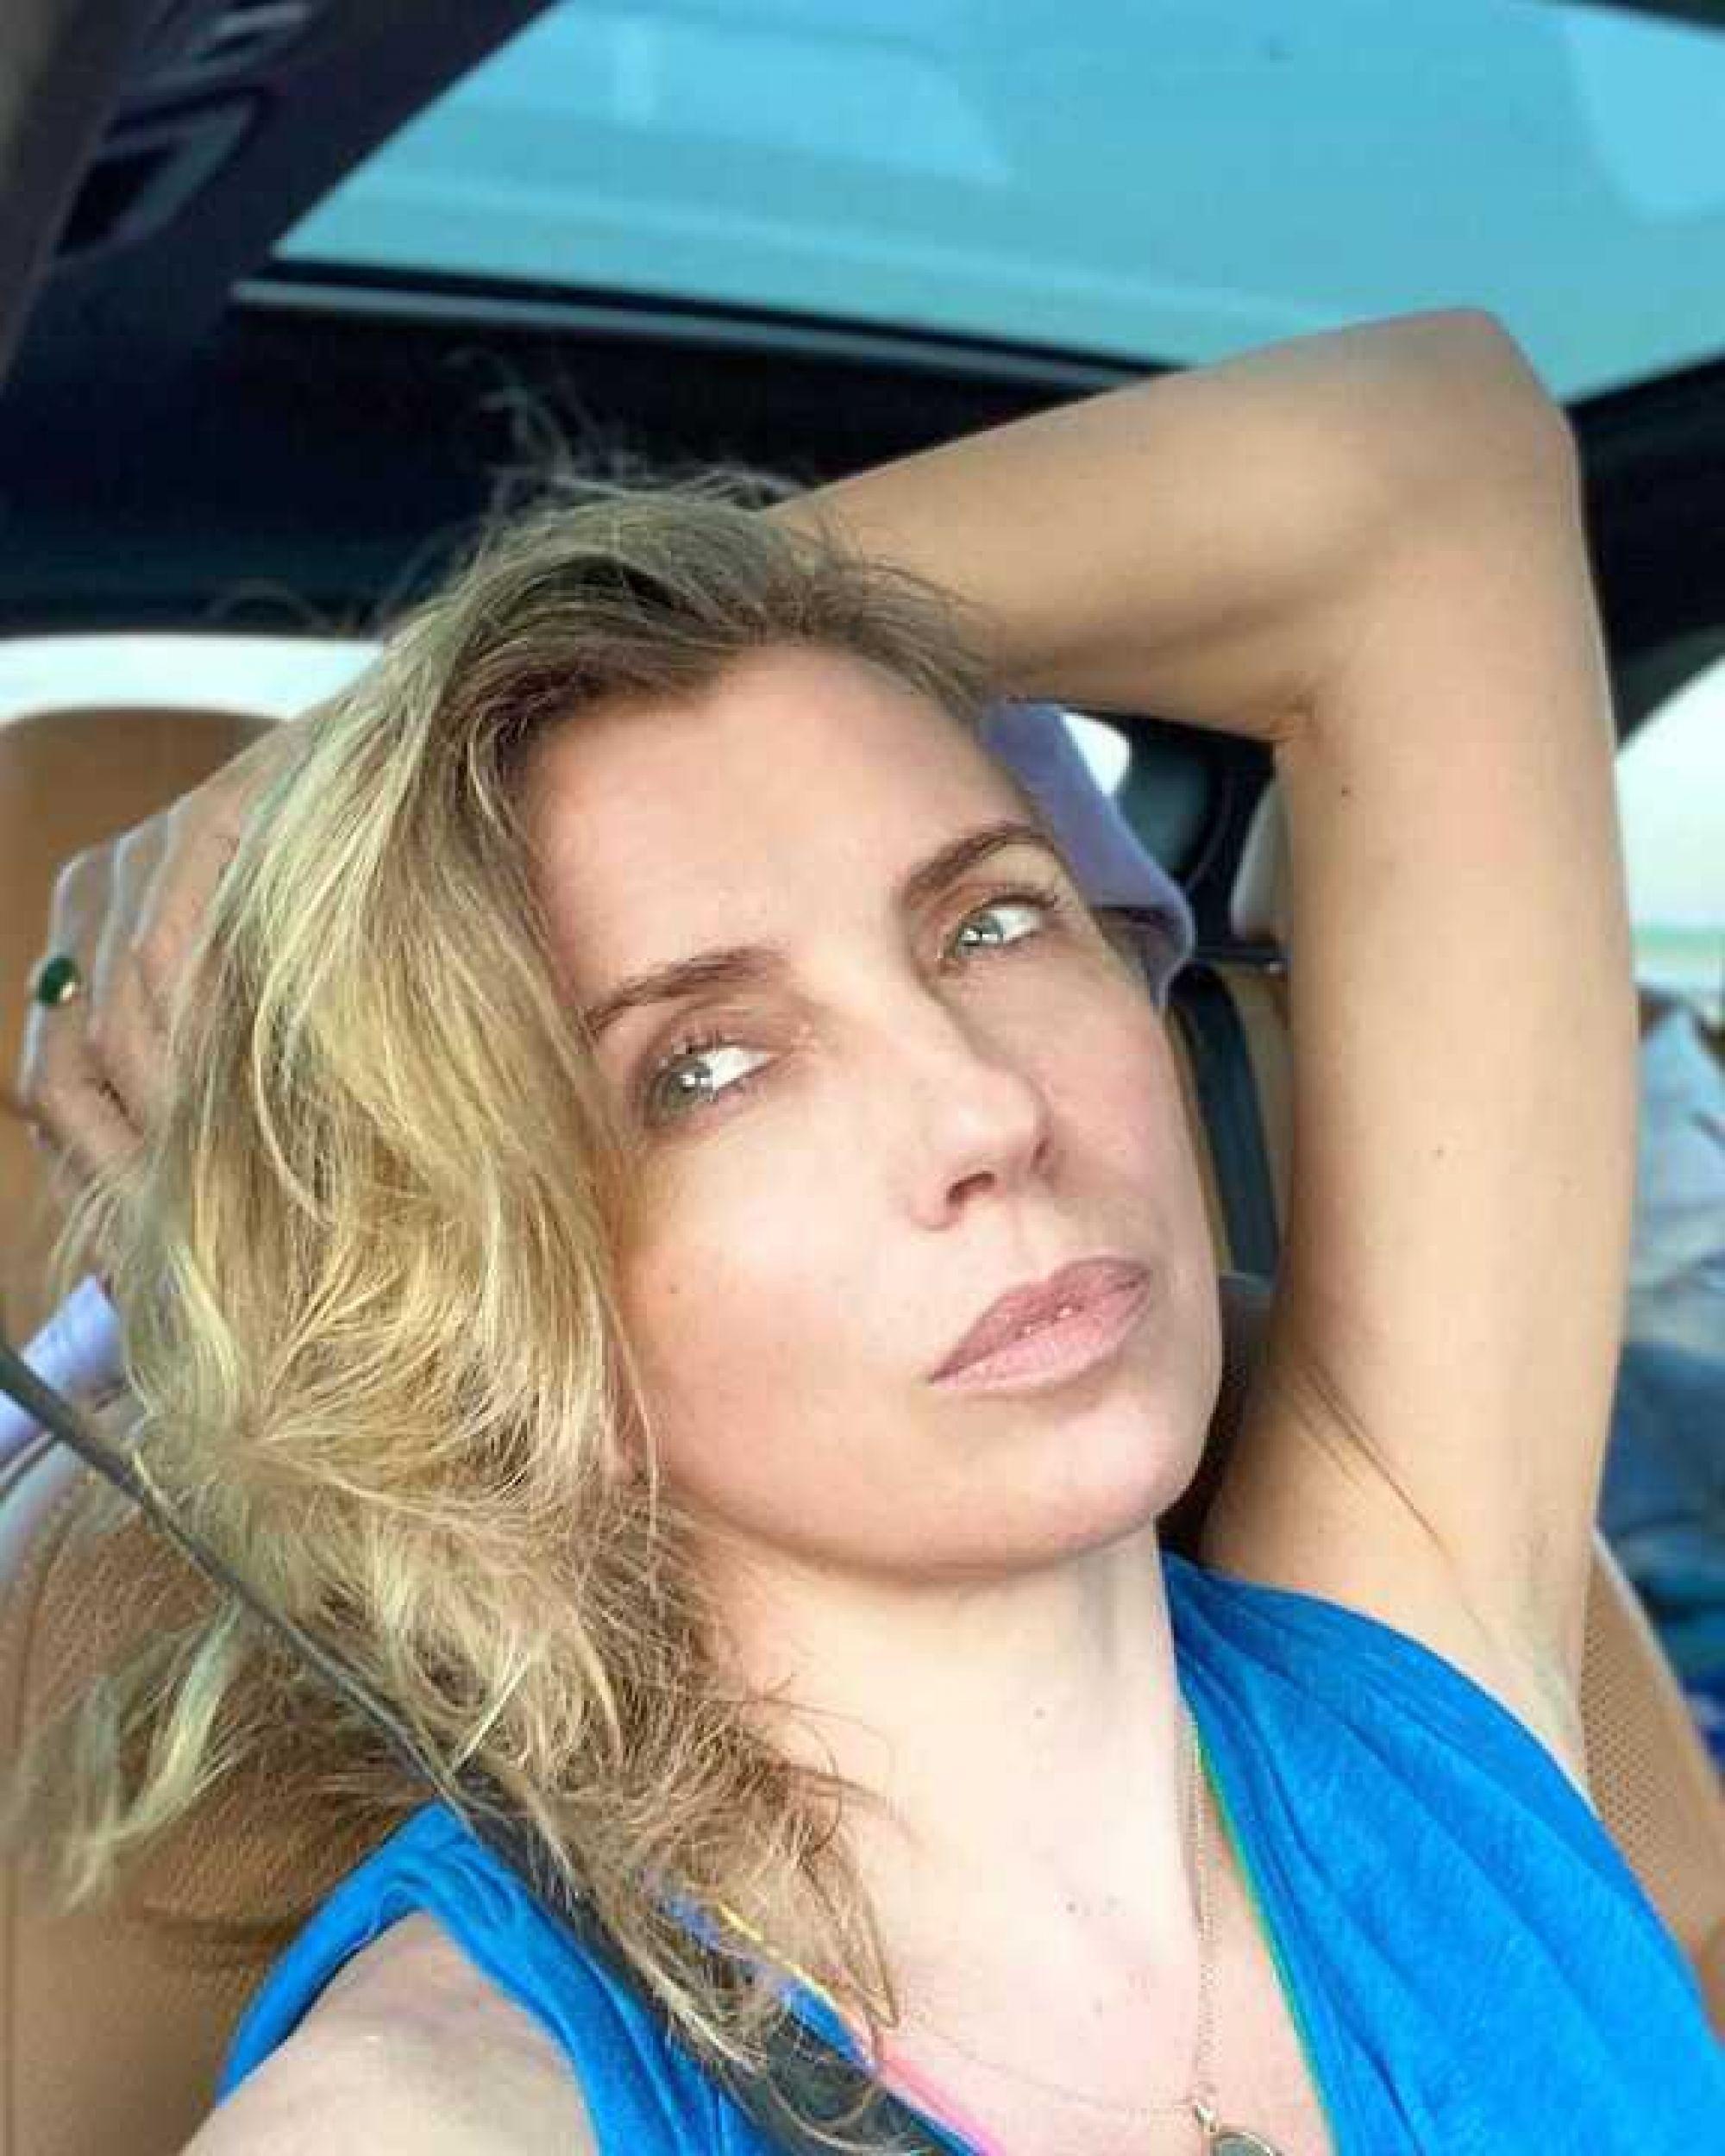 Светлана Бондарчук первая отметила красоту Паулина Андреевой